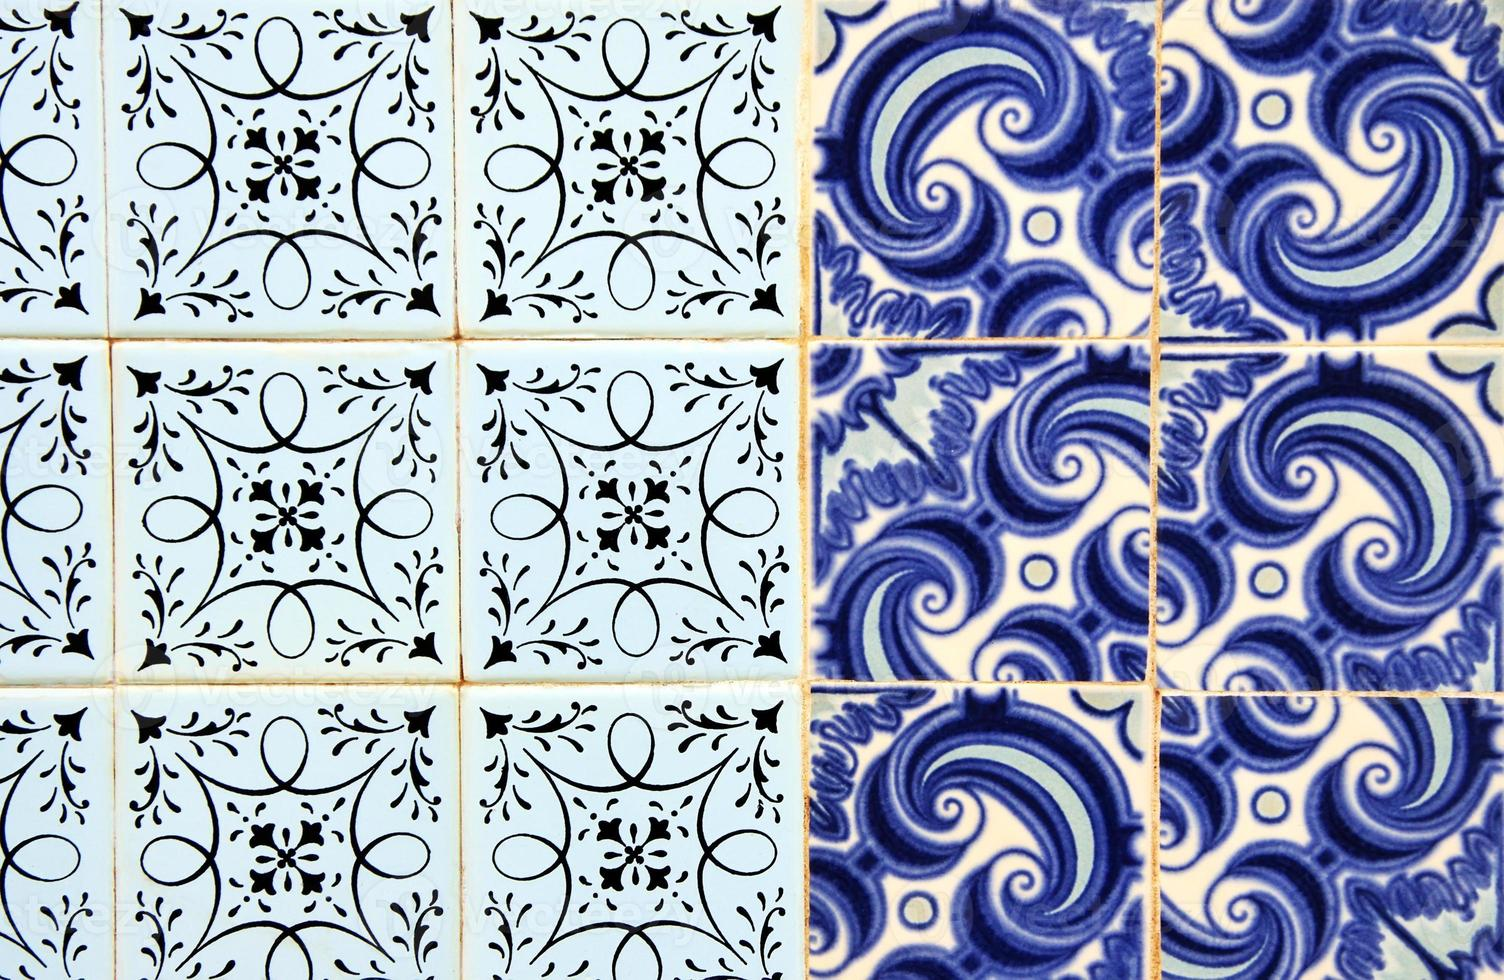 piastrelle portoghesi (azulejos) in una facciata a olhao, algarve foto